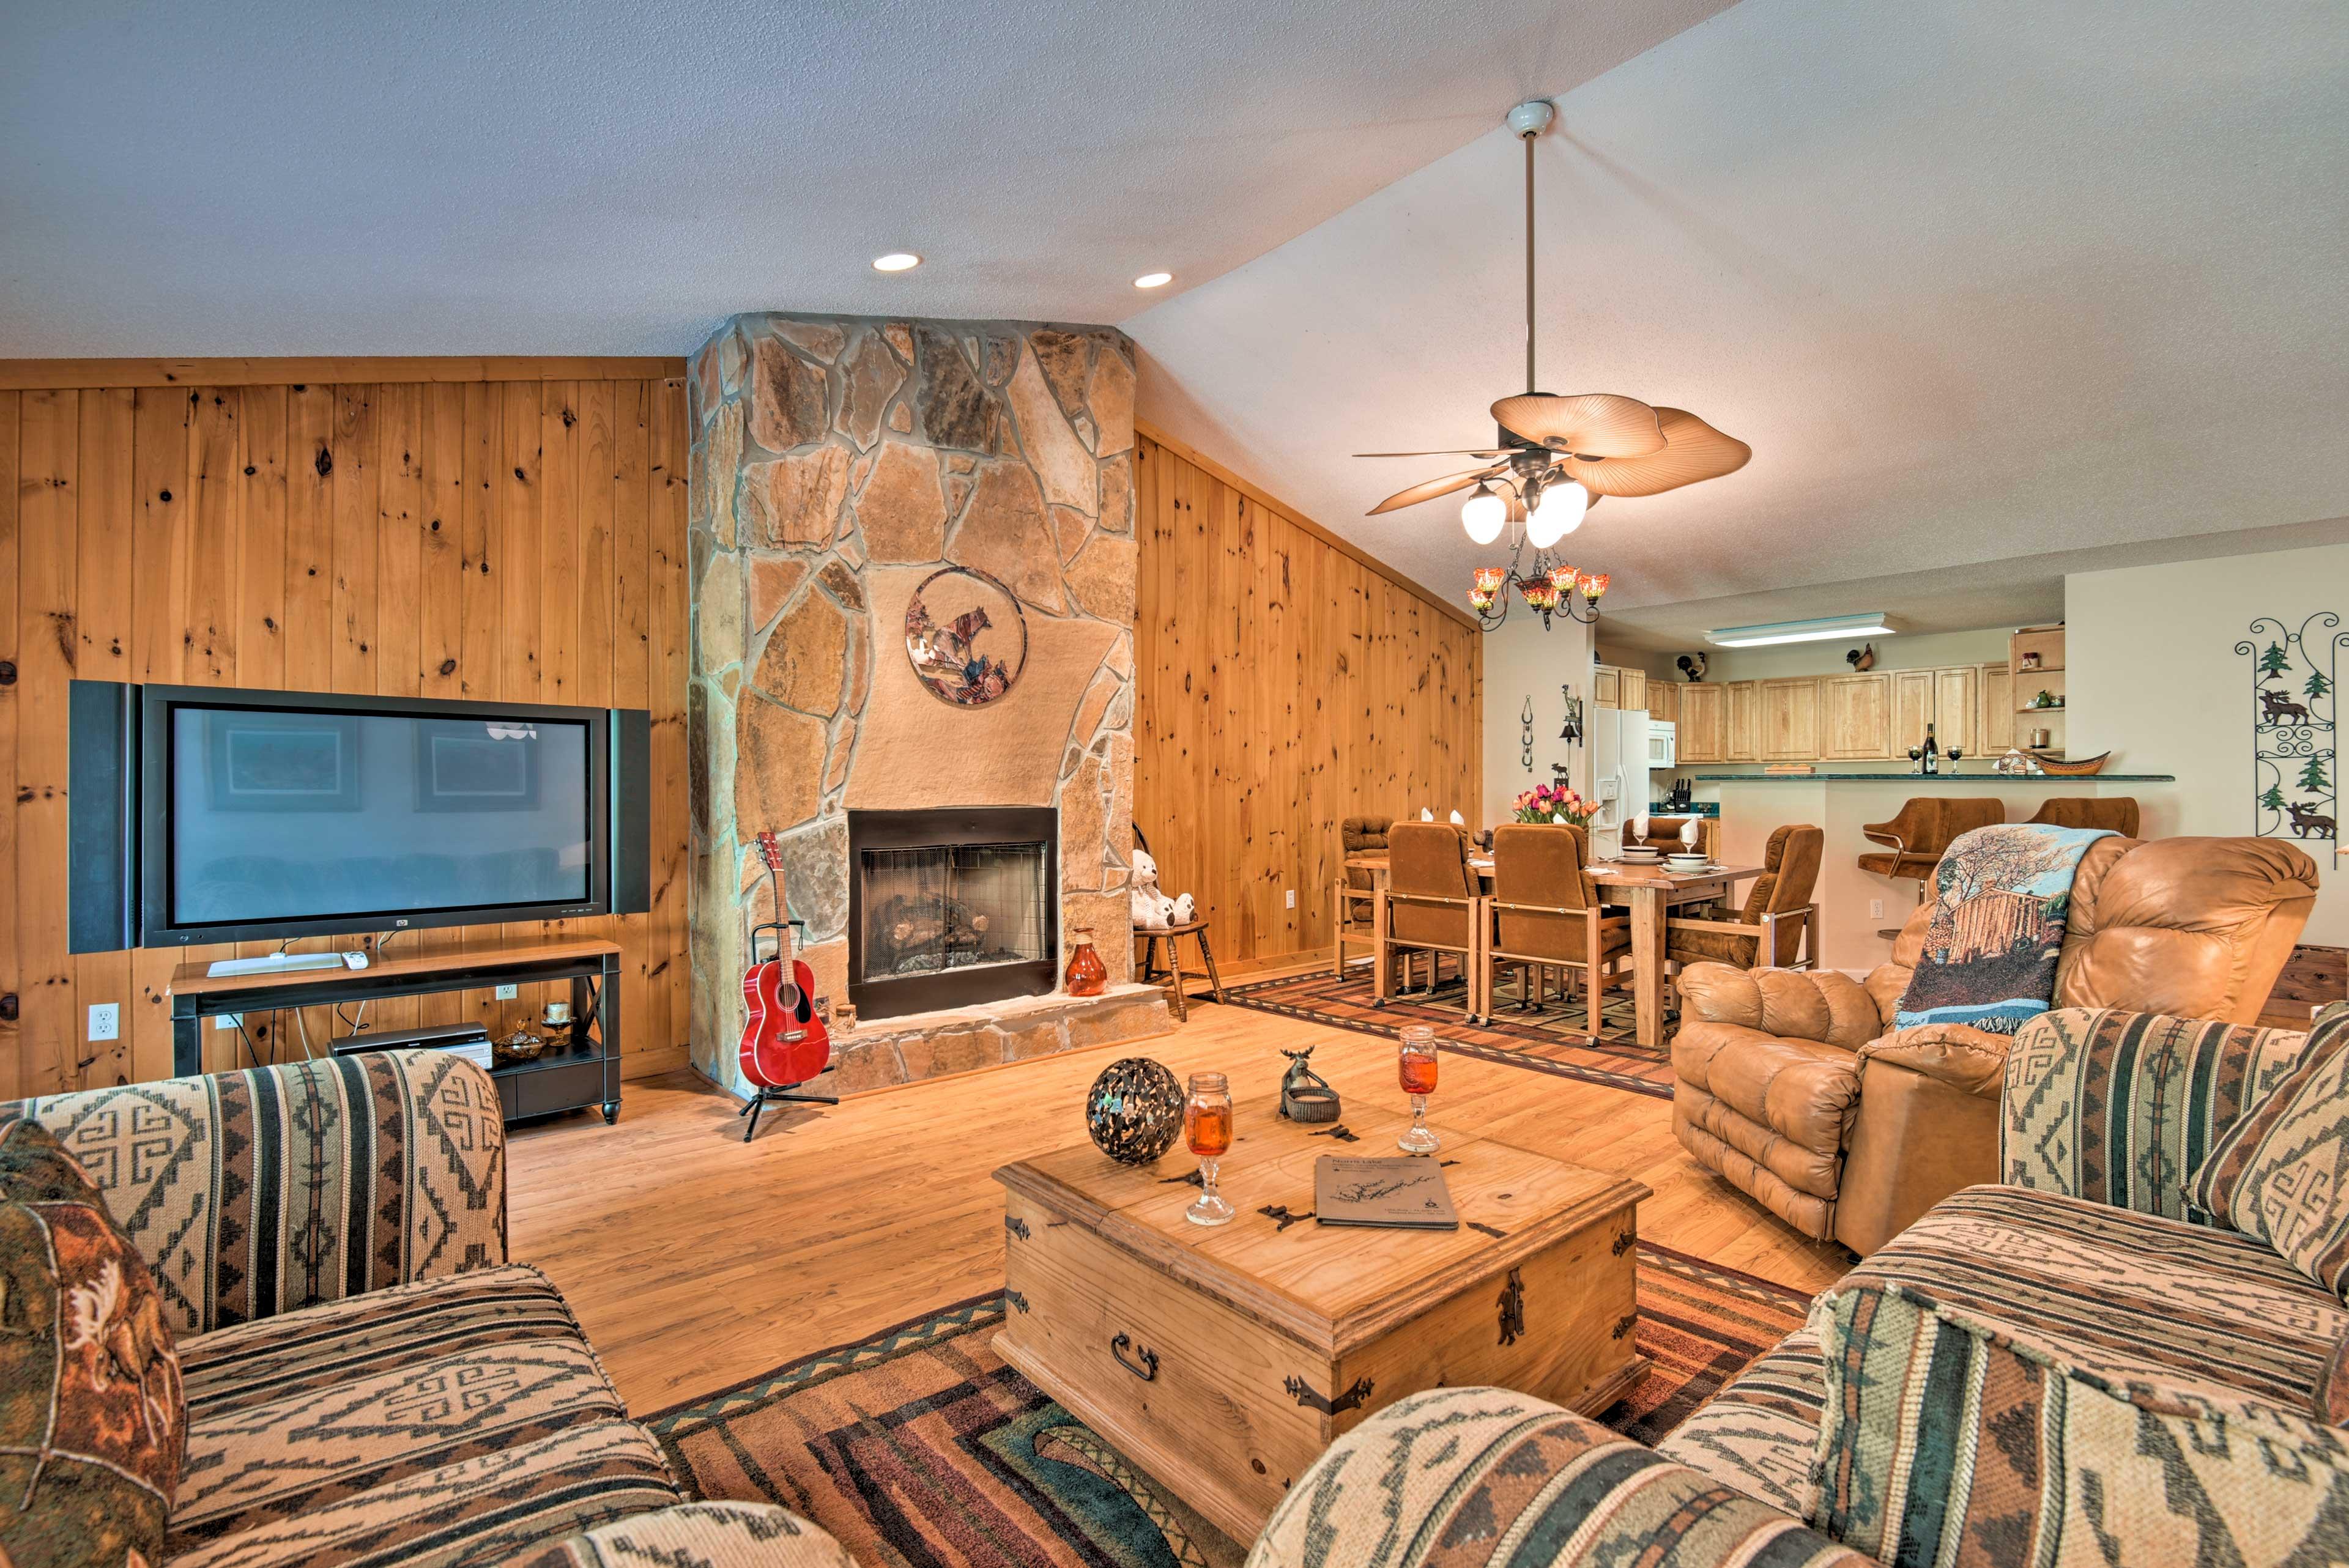 Unwind in this 2-bedroom, 2-bathroom vacation rental townhome.